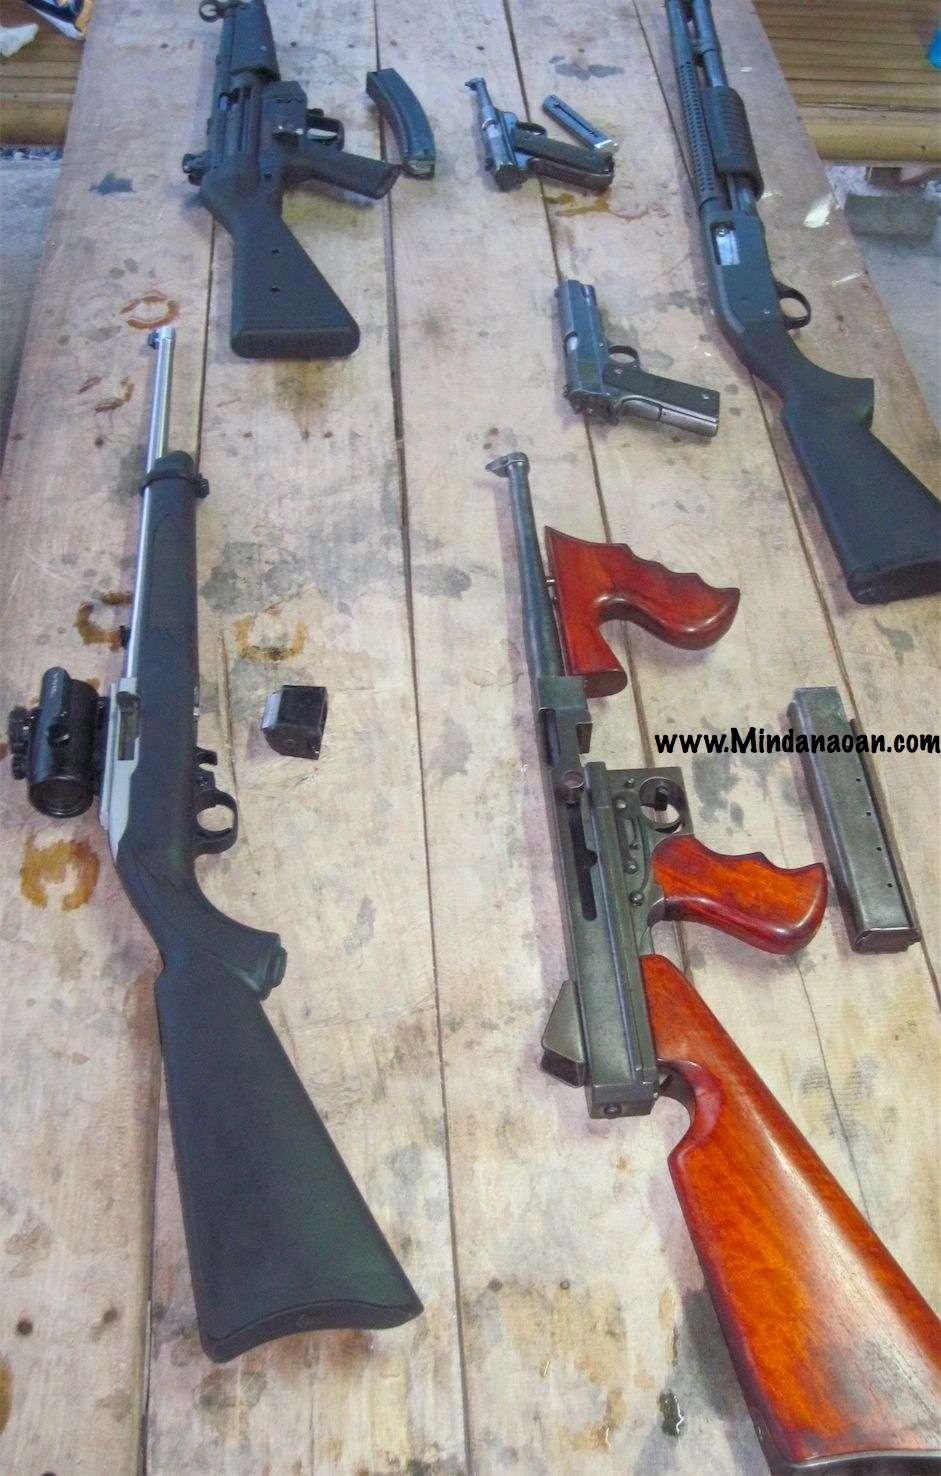 guns nmpsa